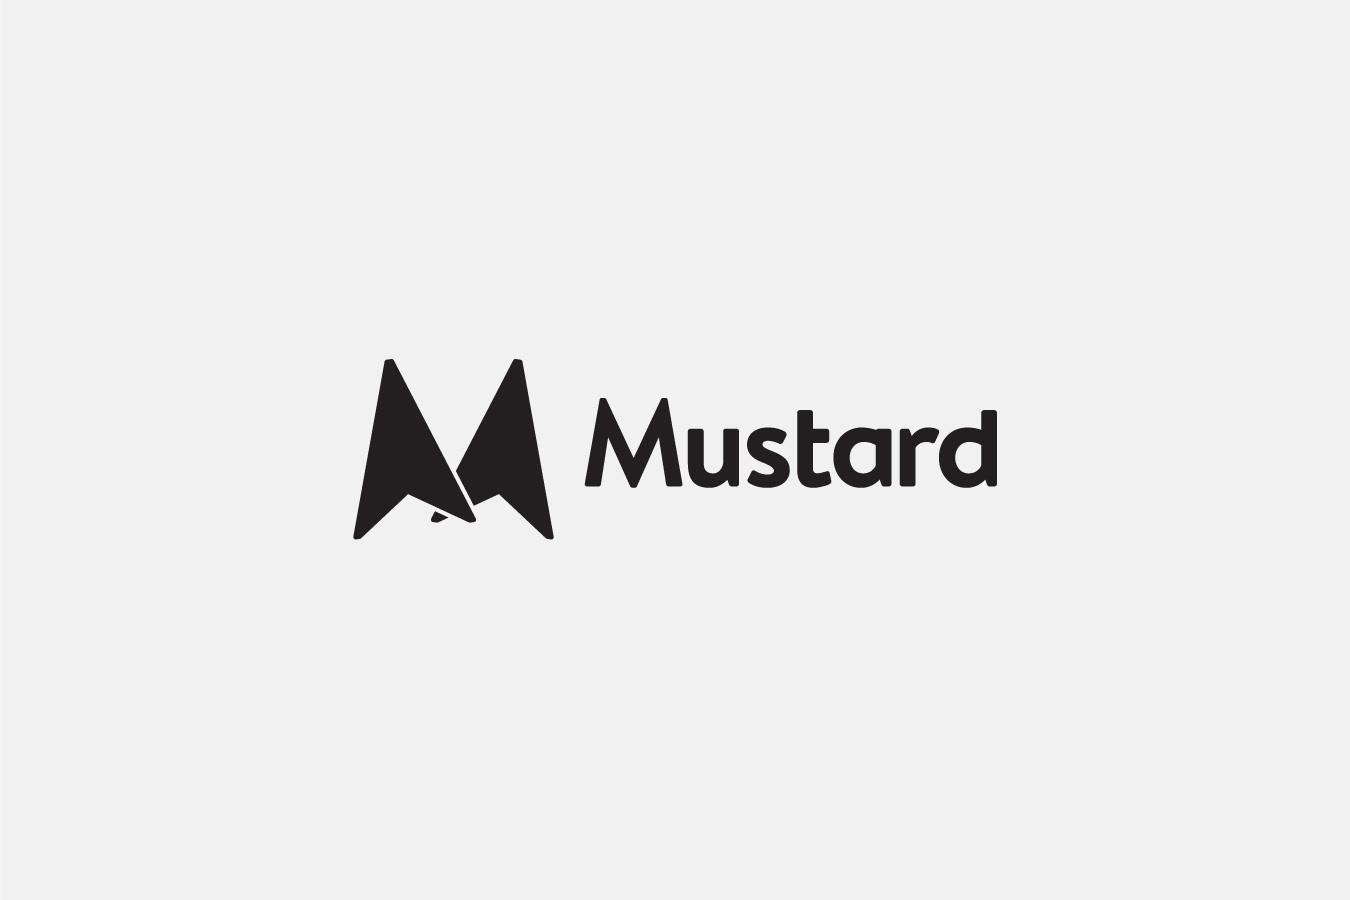 mustard-business-advisory-hdd-3